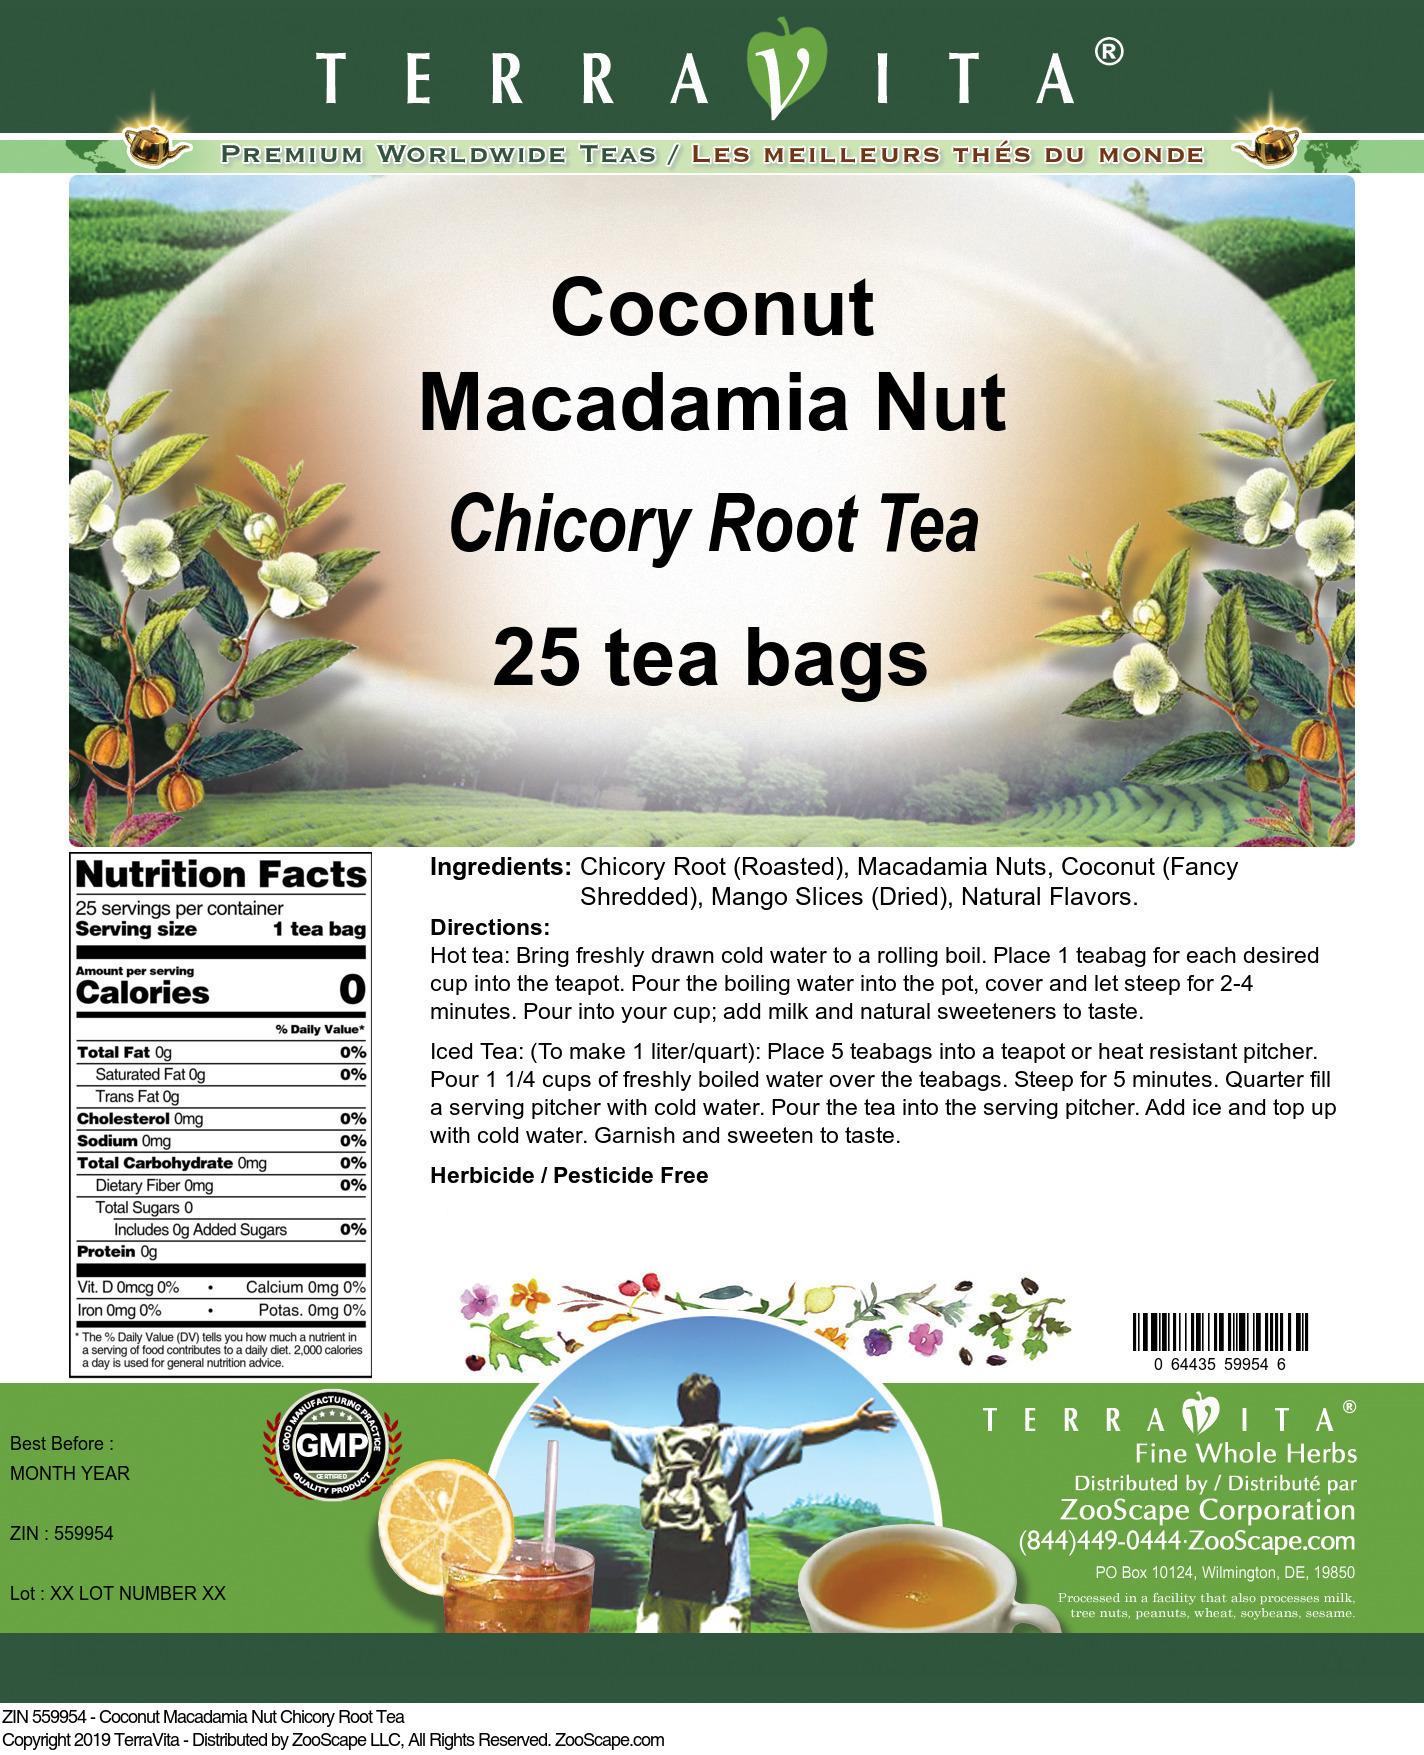 Coconut Macadamia Nut Chicory Root Tea